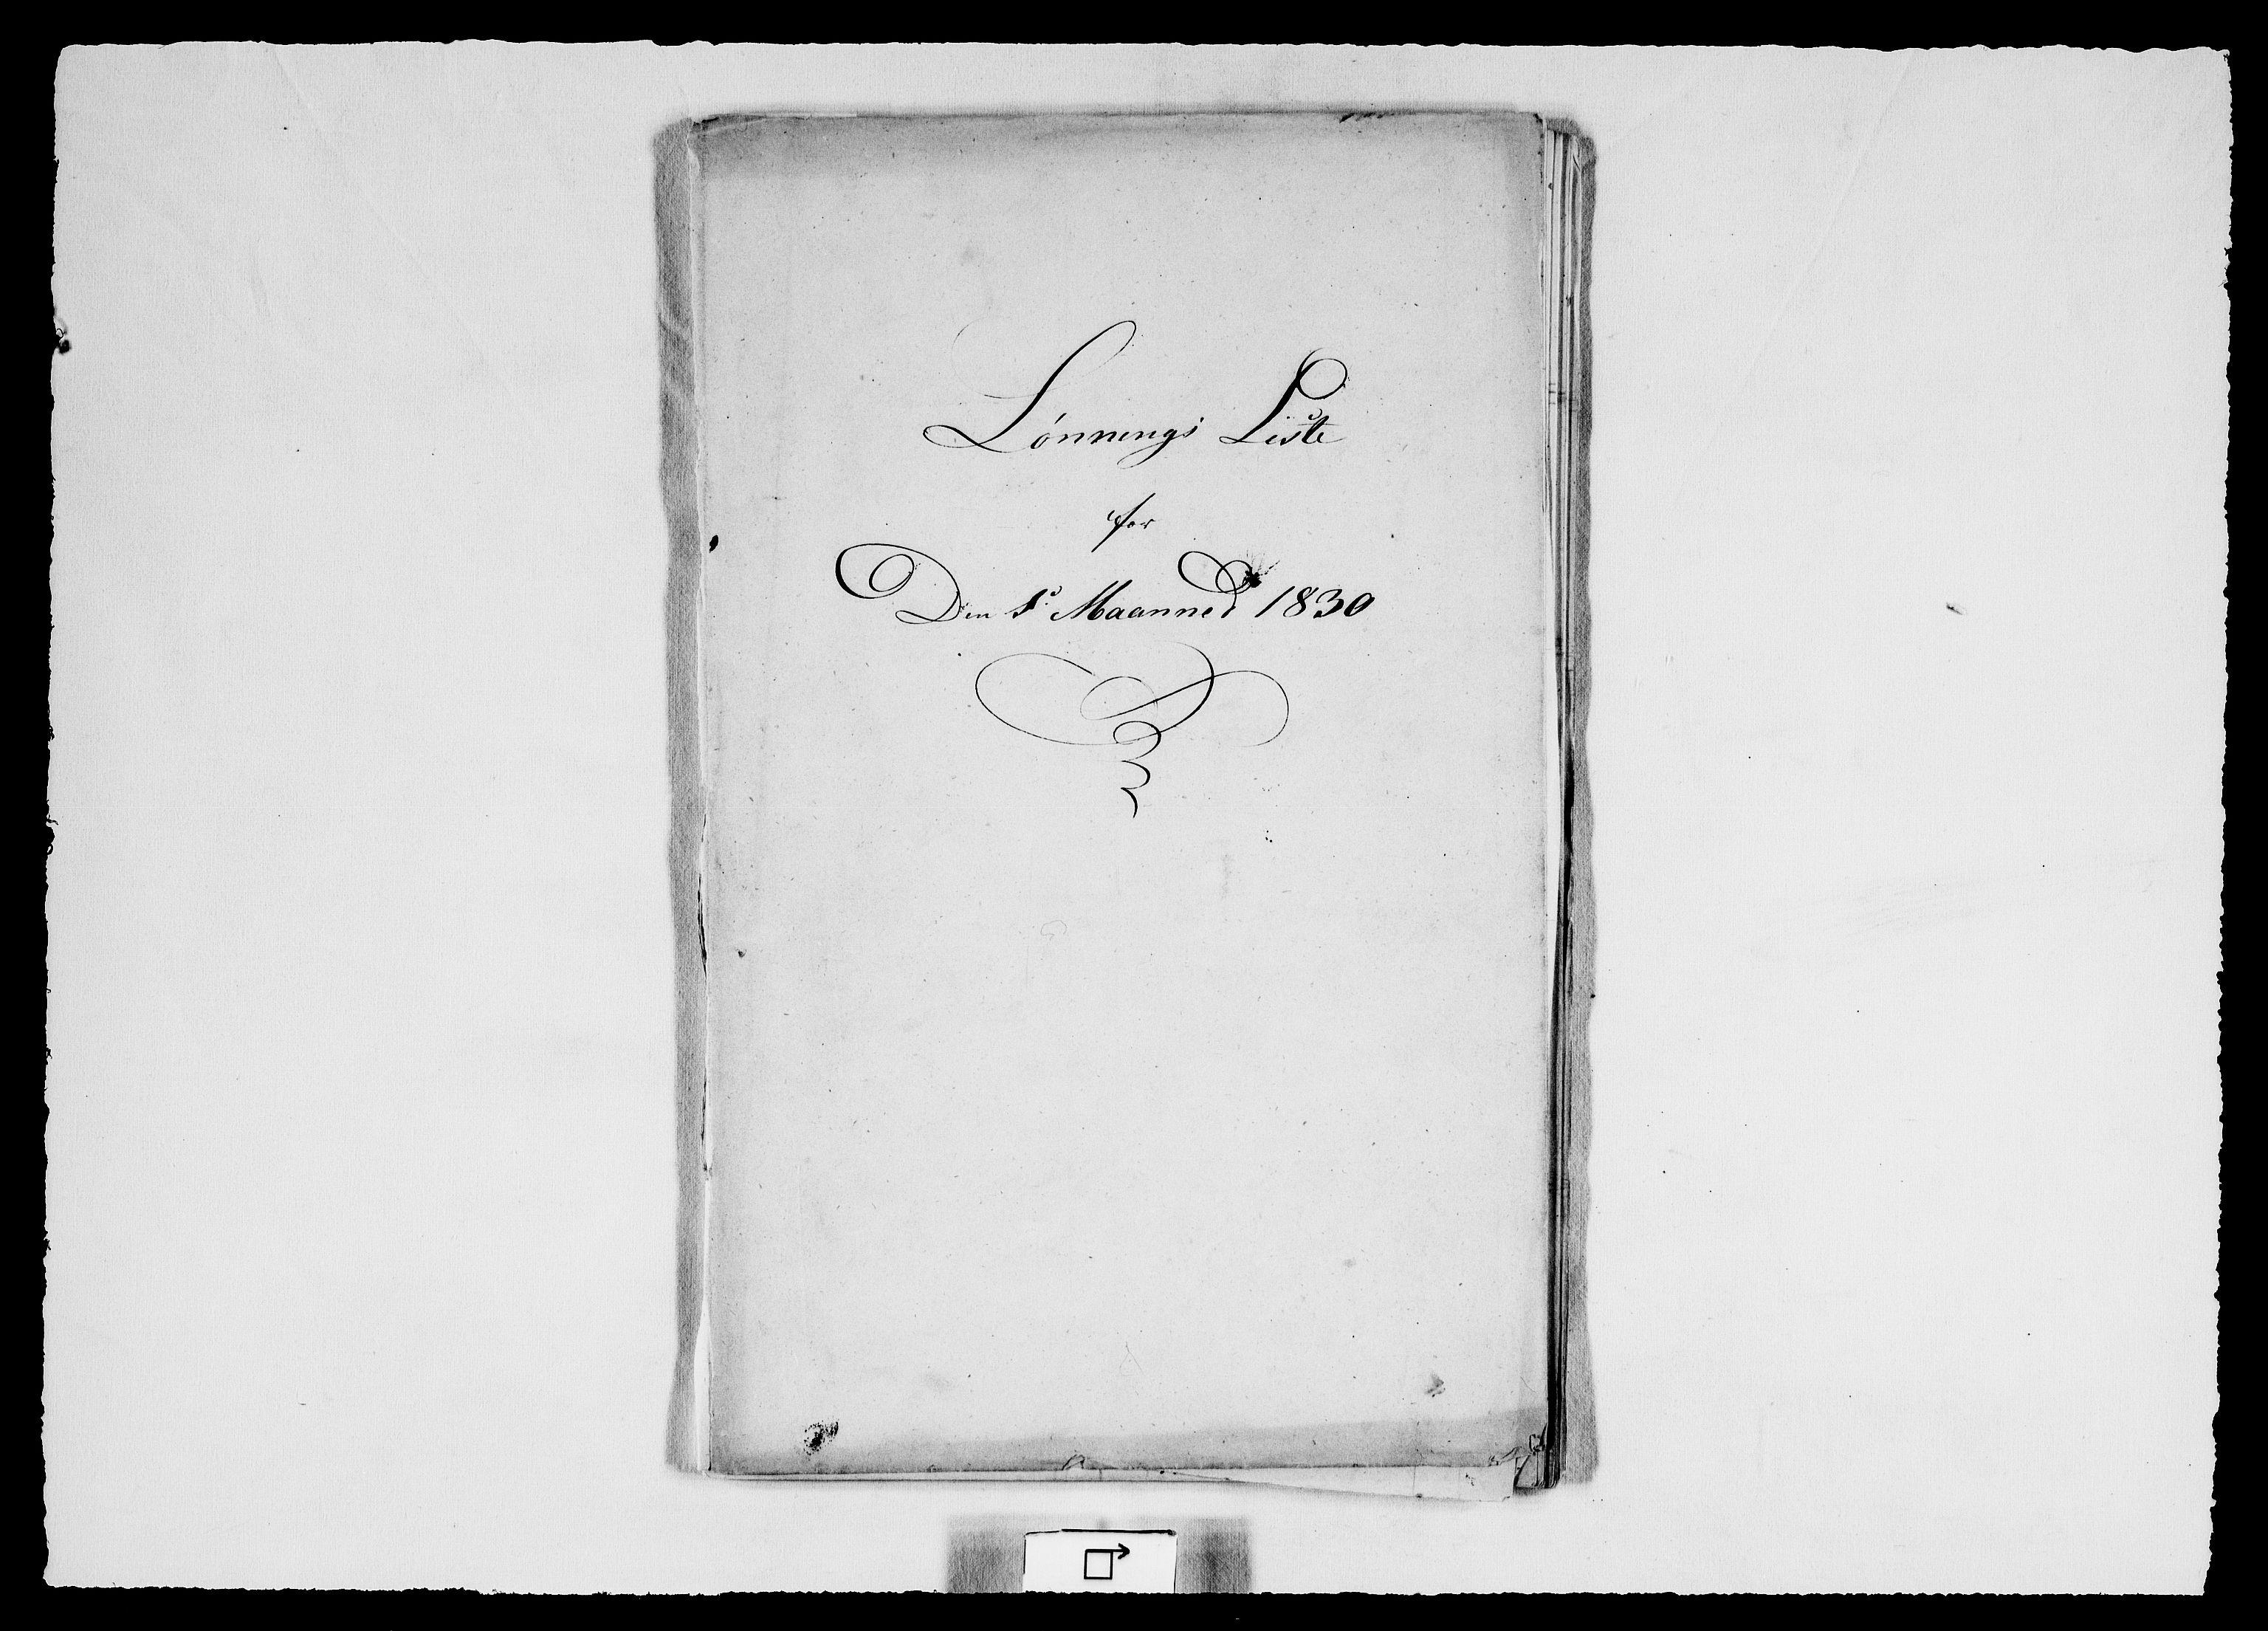 RA, Modums Blaafarveværk, G/Gd/Gdd/L0294, 1830, s. 2